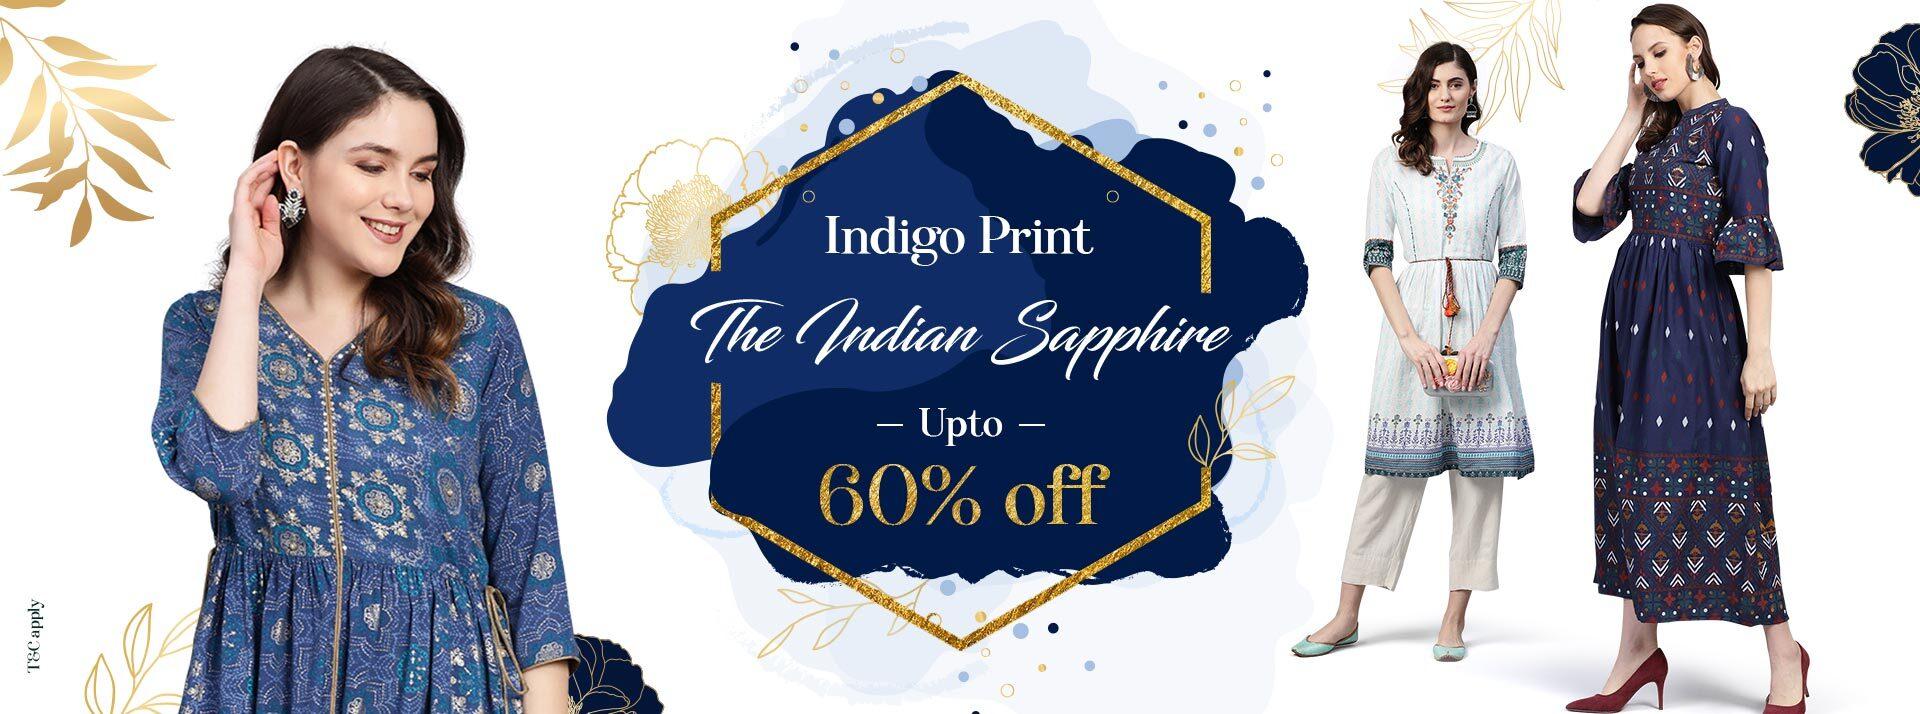 Indigo Prints